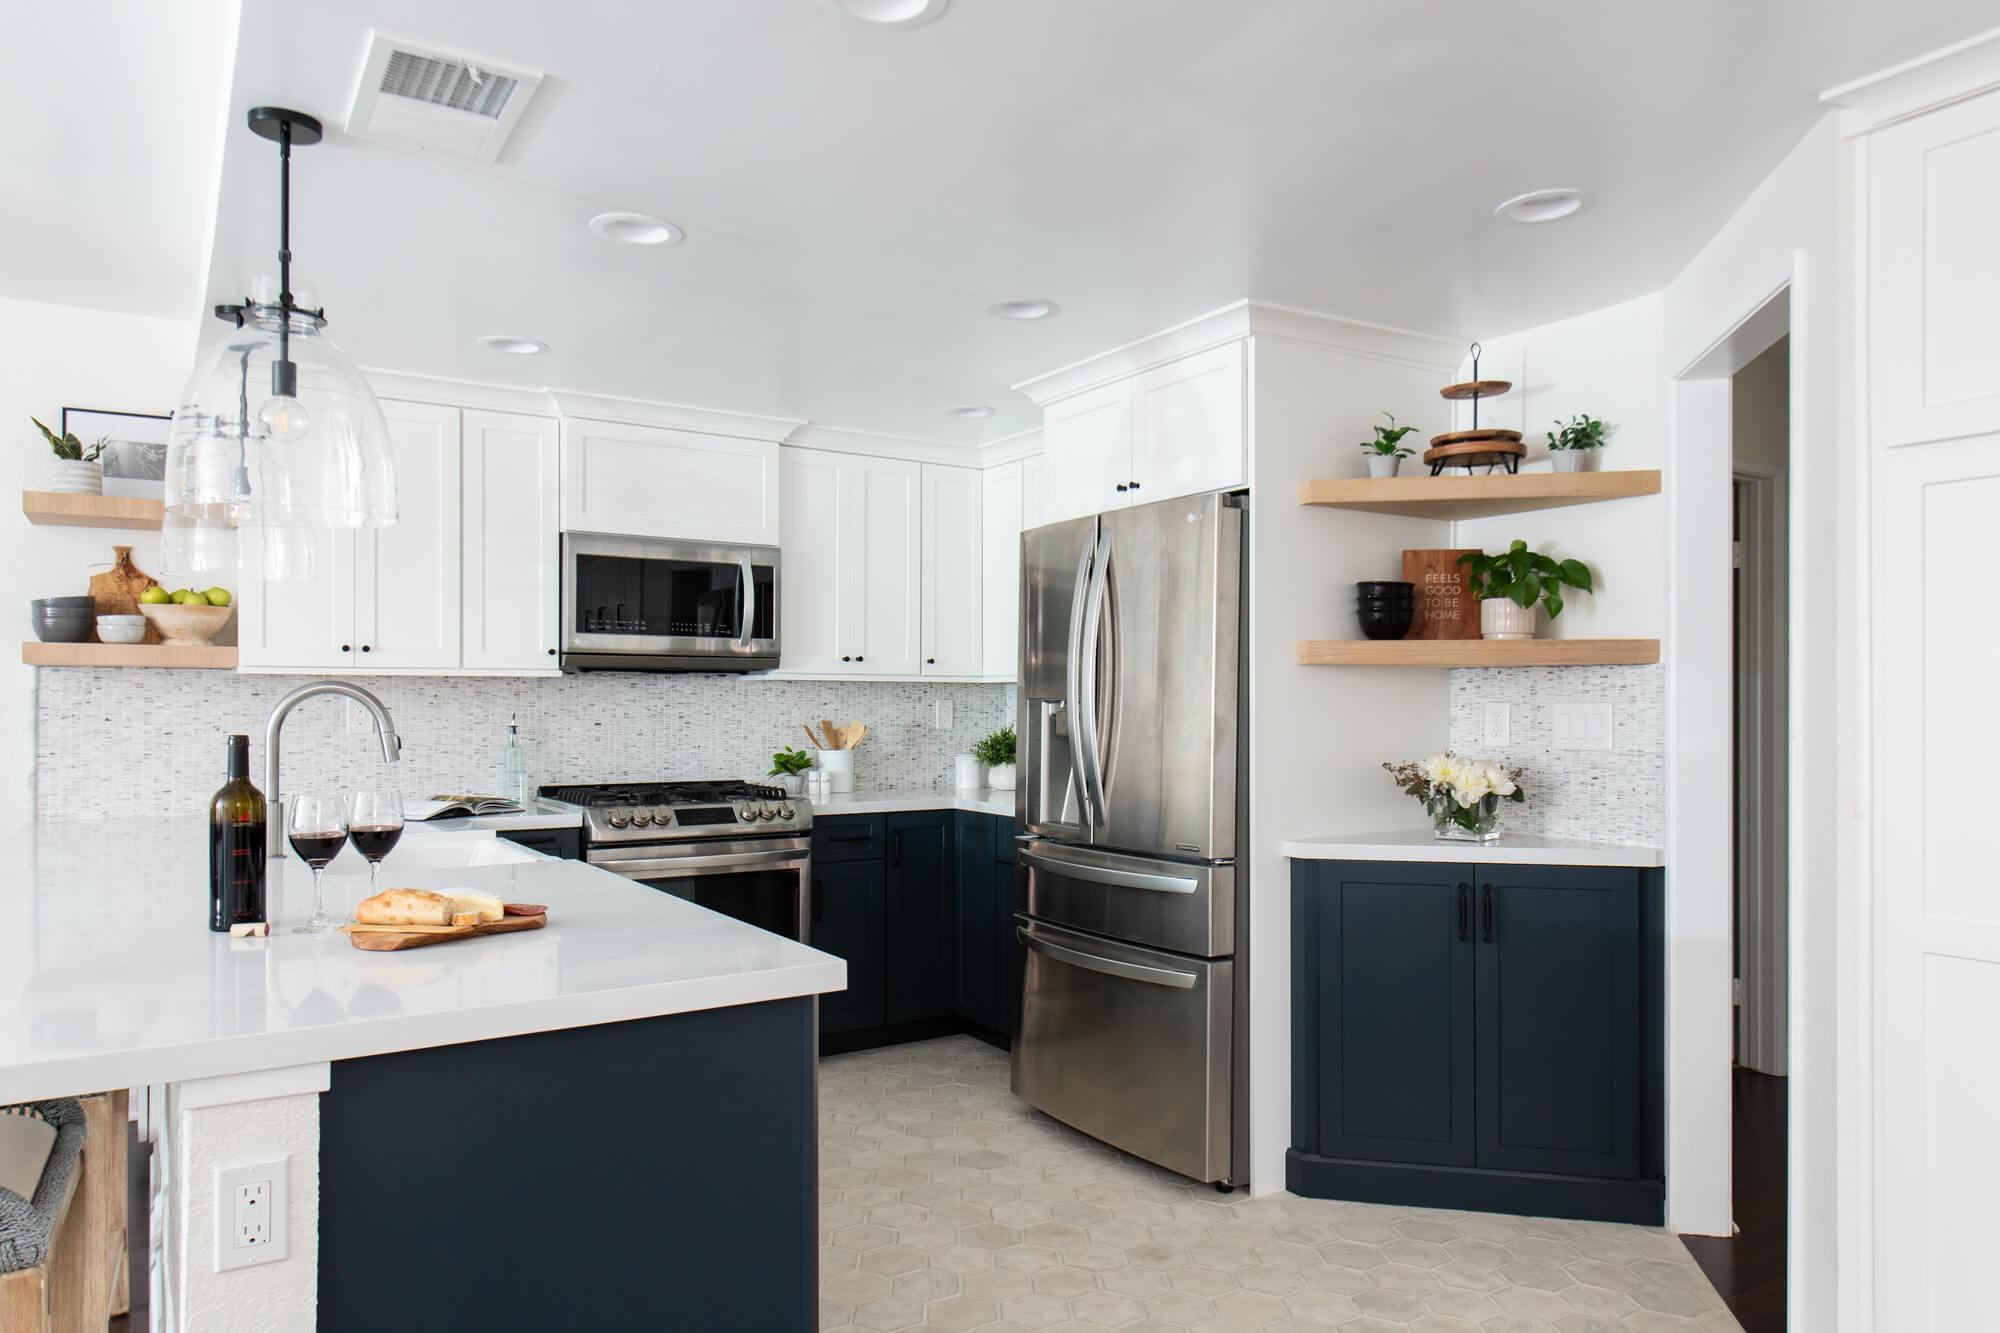 Modern kitchen design for Laguna Niguel farmhouse kitchen remodel